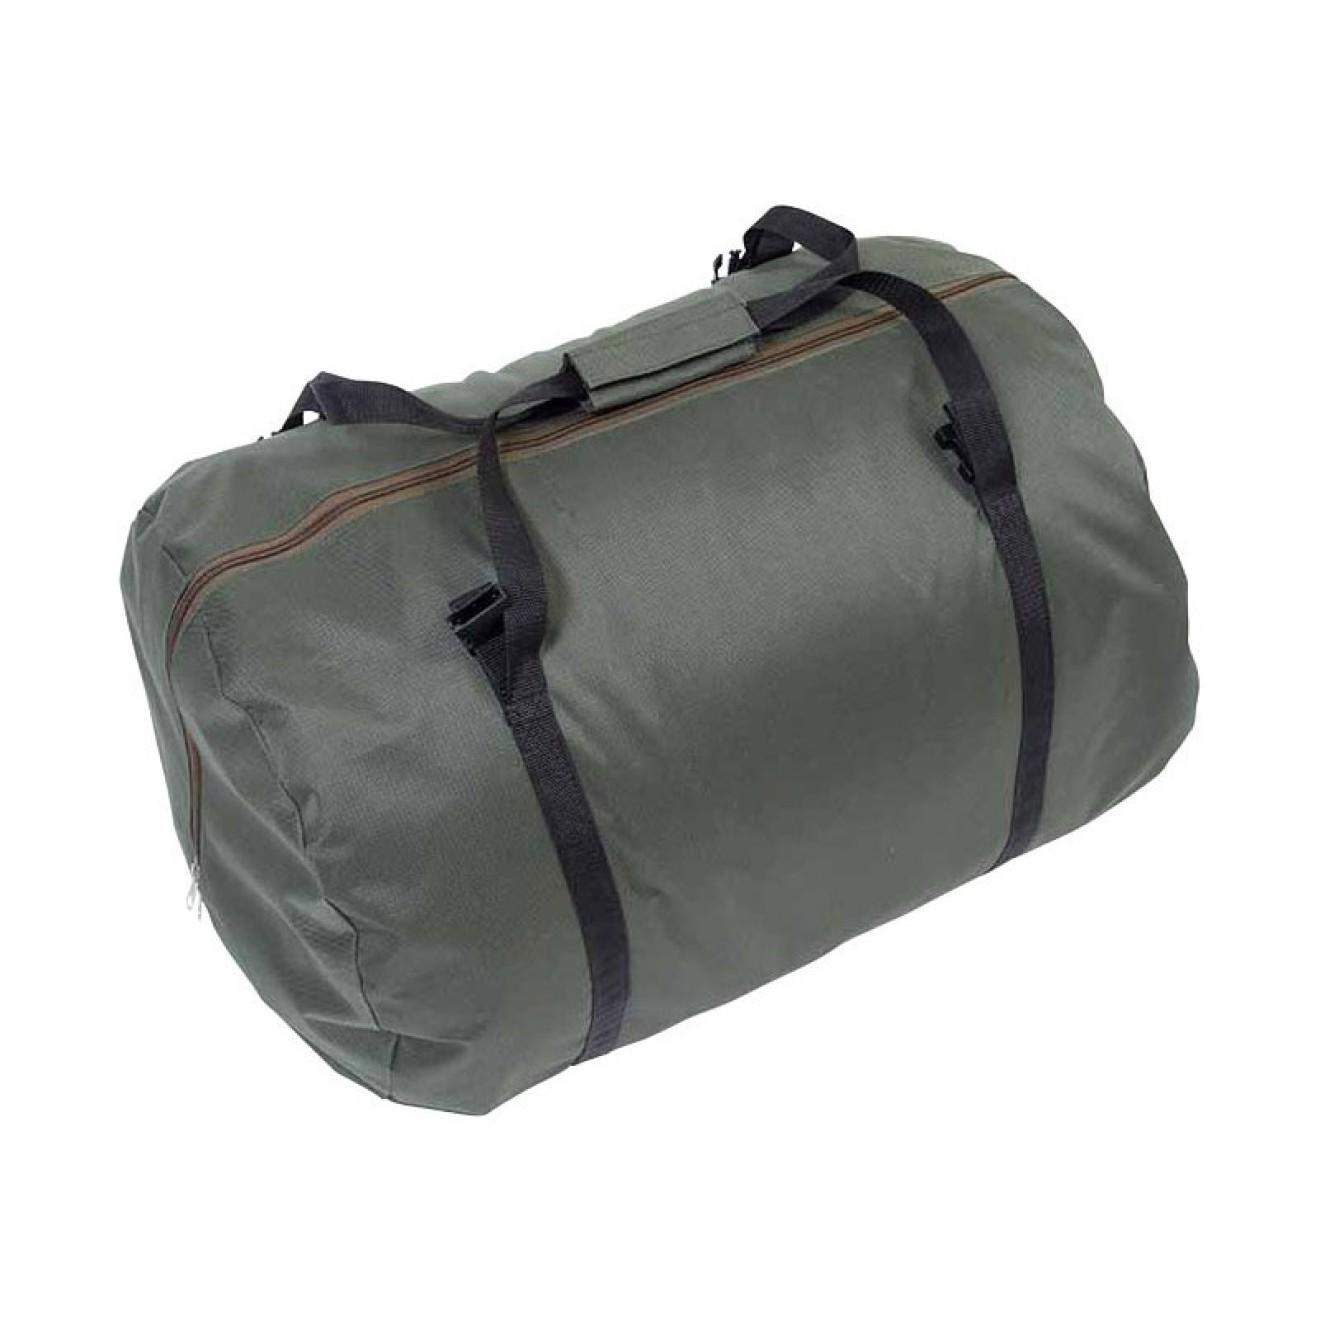 Avid Carp Benchmark Sleeping Bag Standard, Carphunter&Co ...